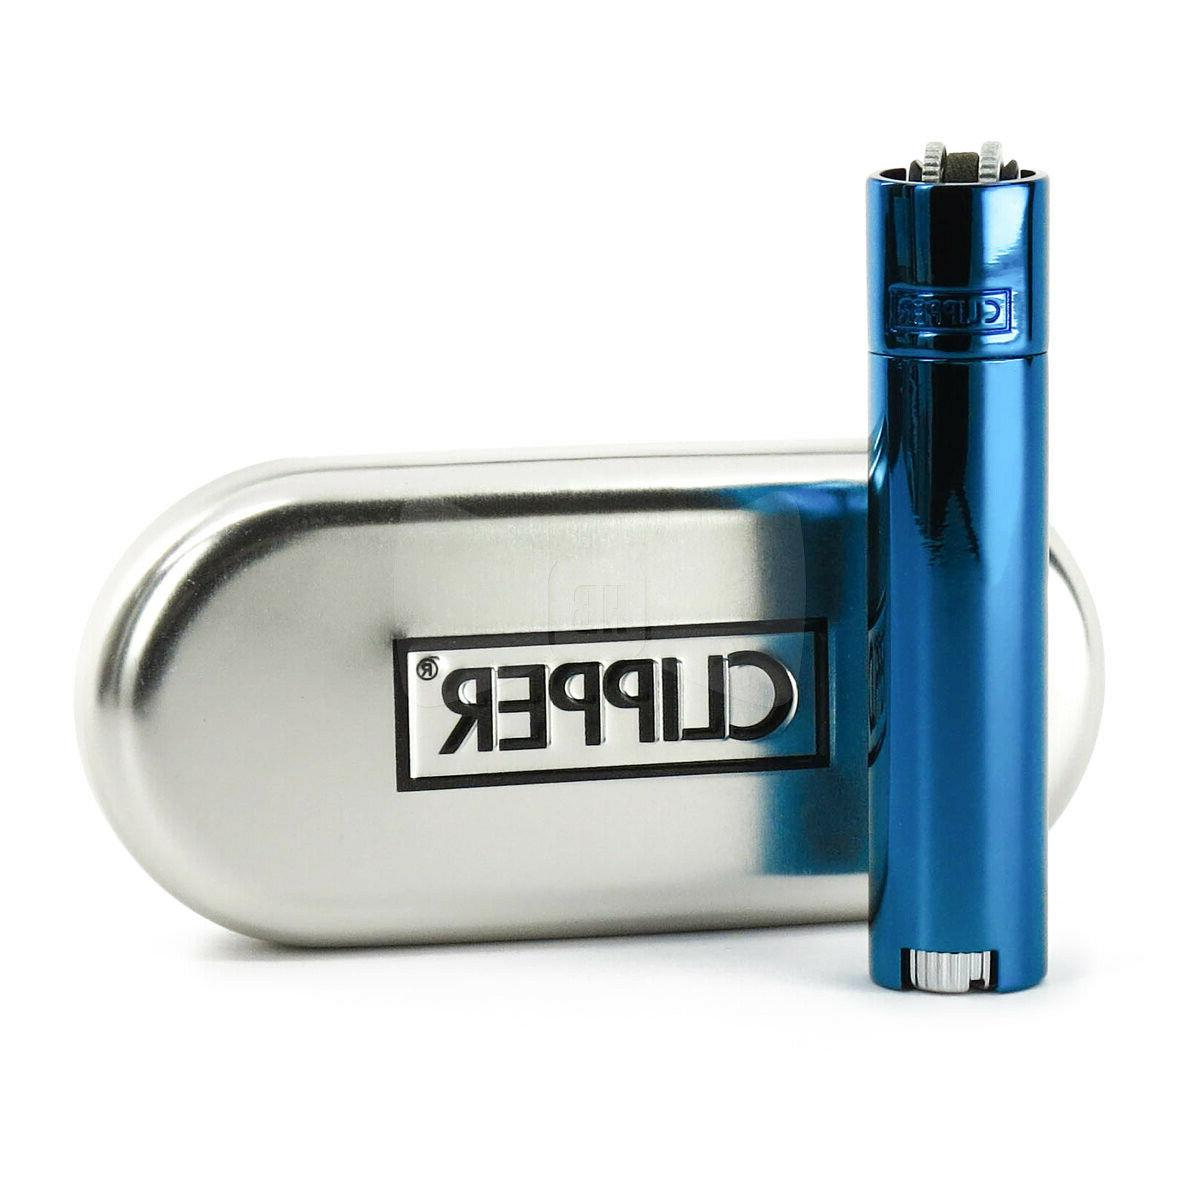 1 x full size metal lighter refillable